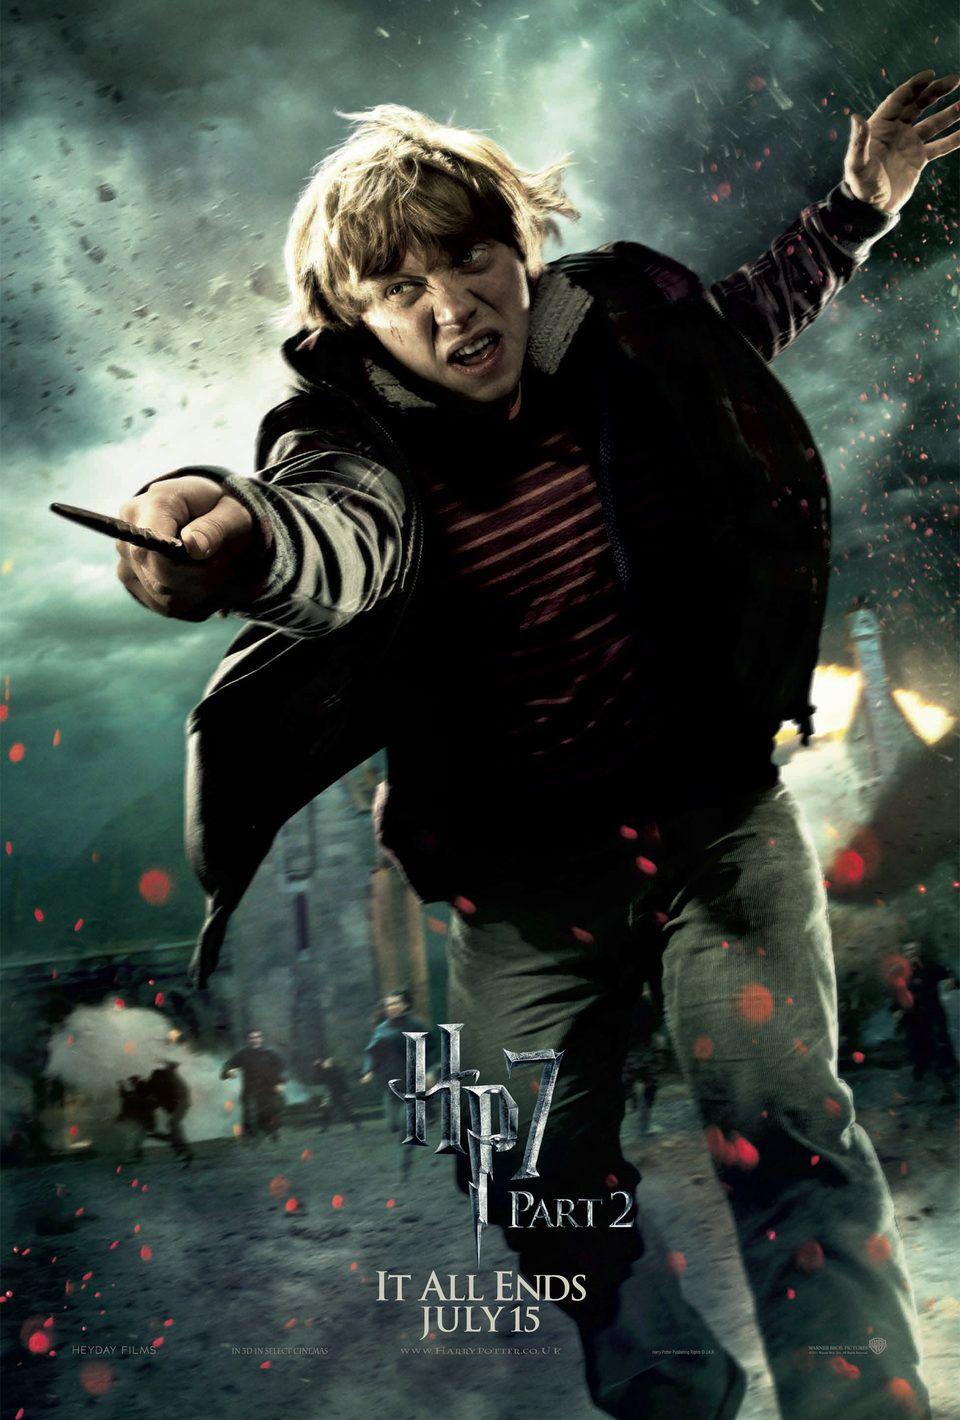 Harry Potter 8 Harry Potter Ve Olum Yadigarlari Bolum 2 The Deathly Hallows Part 2 Deathly Hallows Harry Potter Macera Filmleri